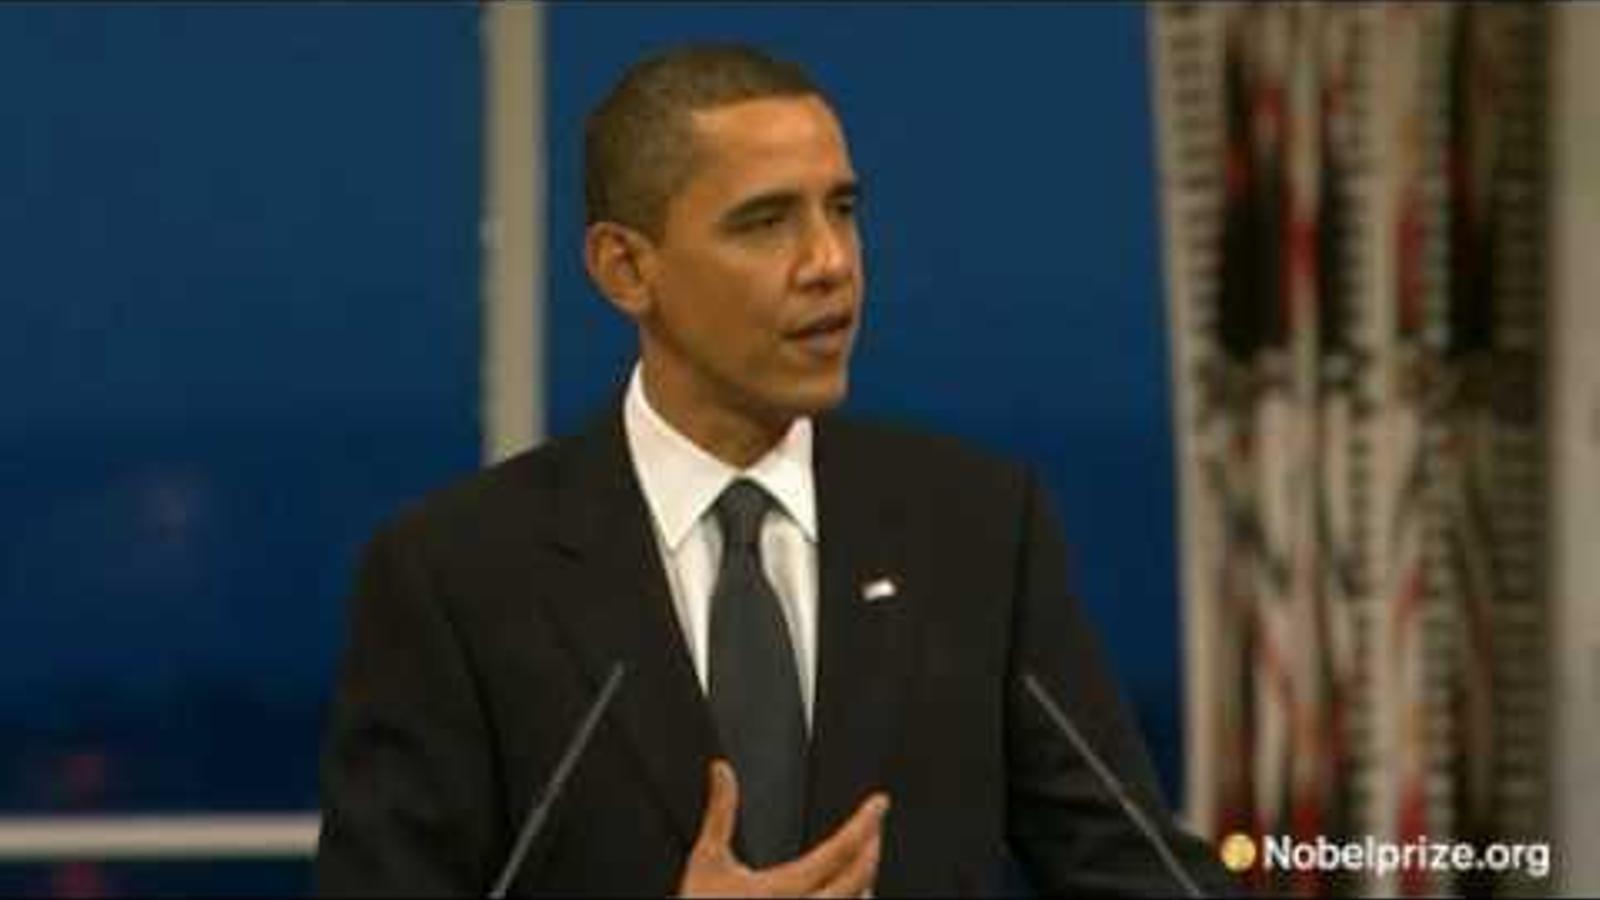 Obama, Premi Nobel de la Pau